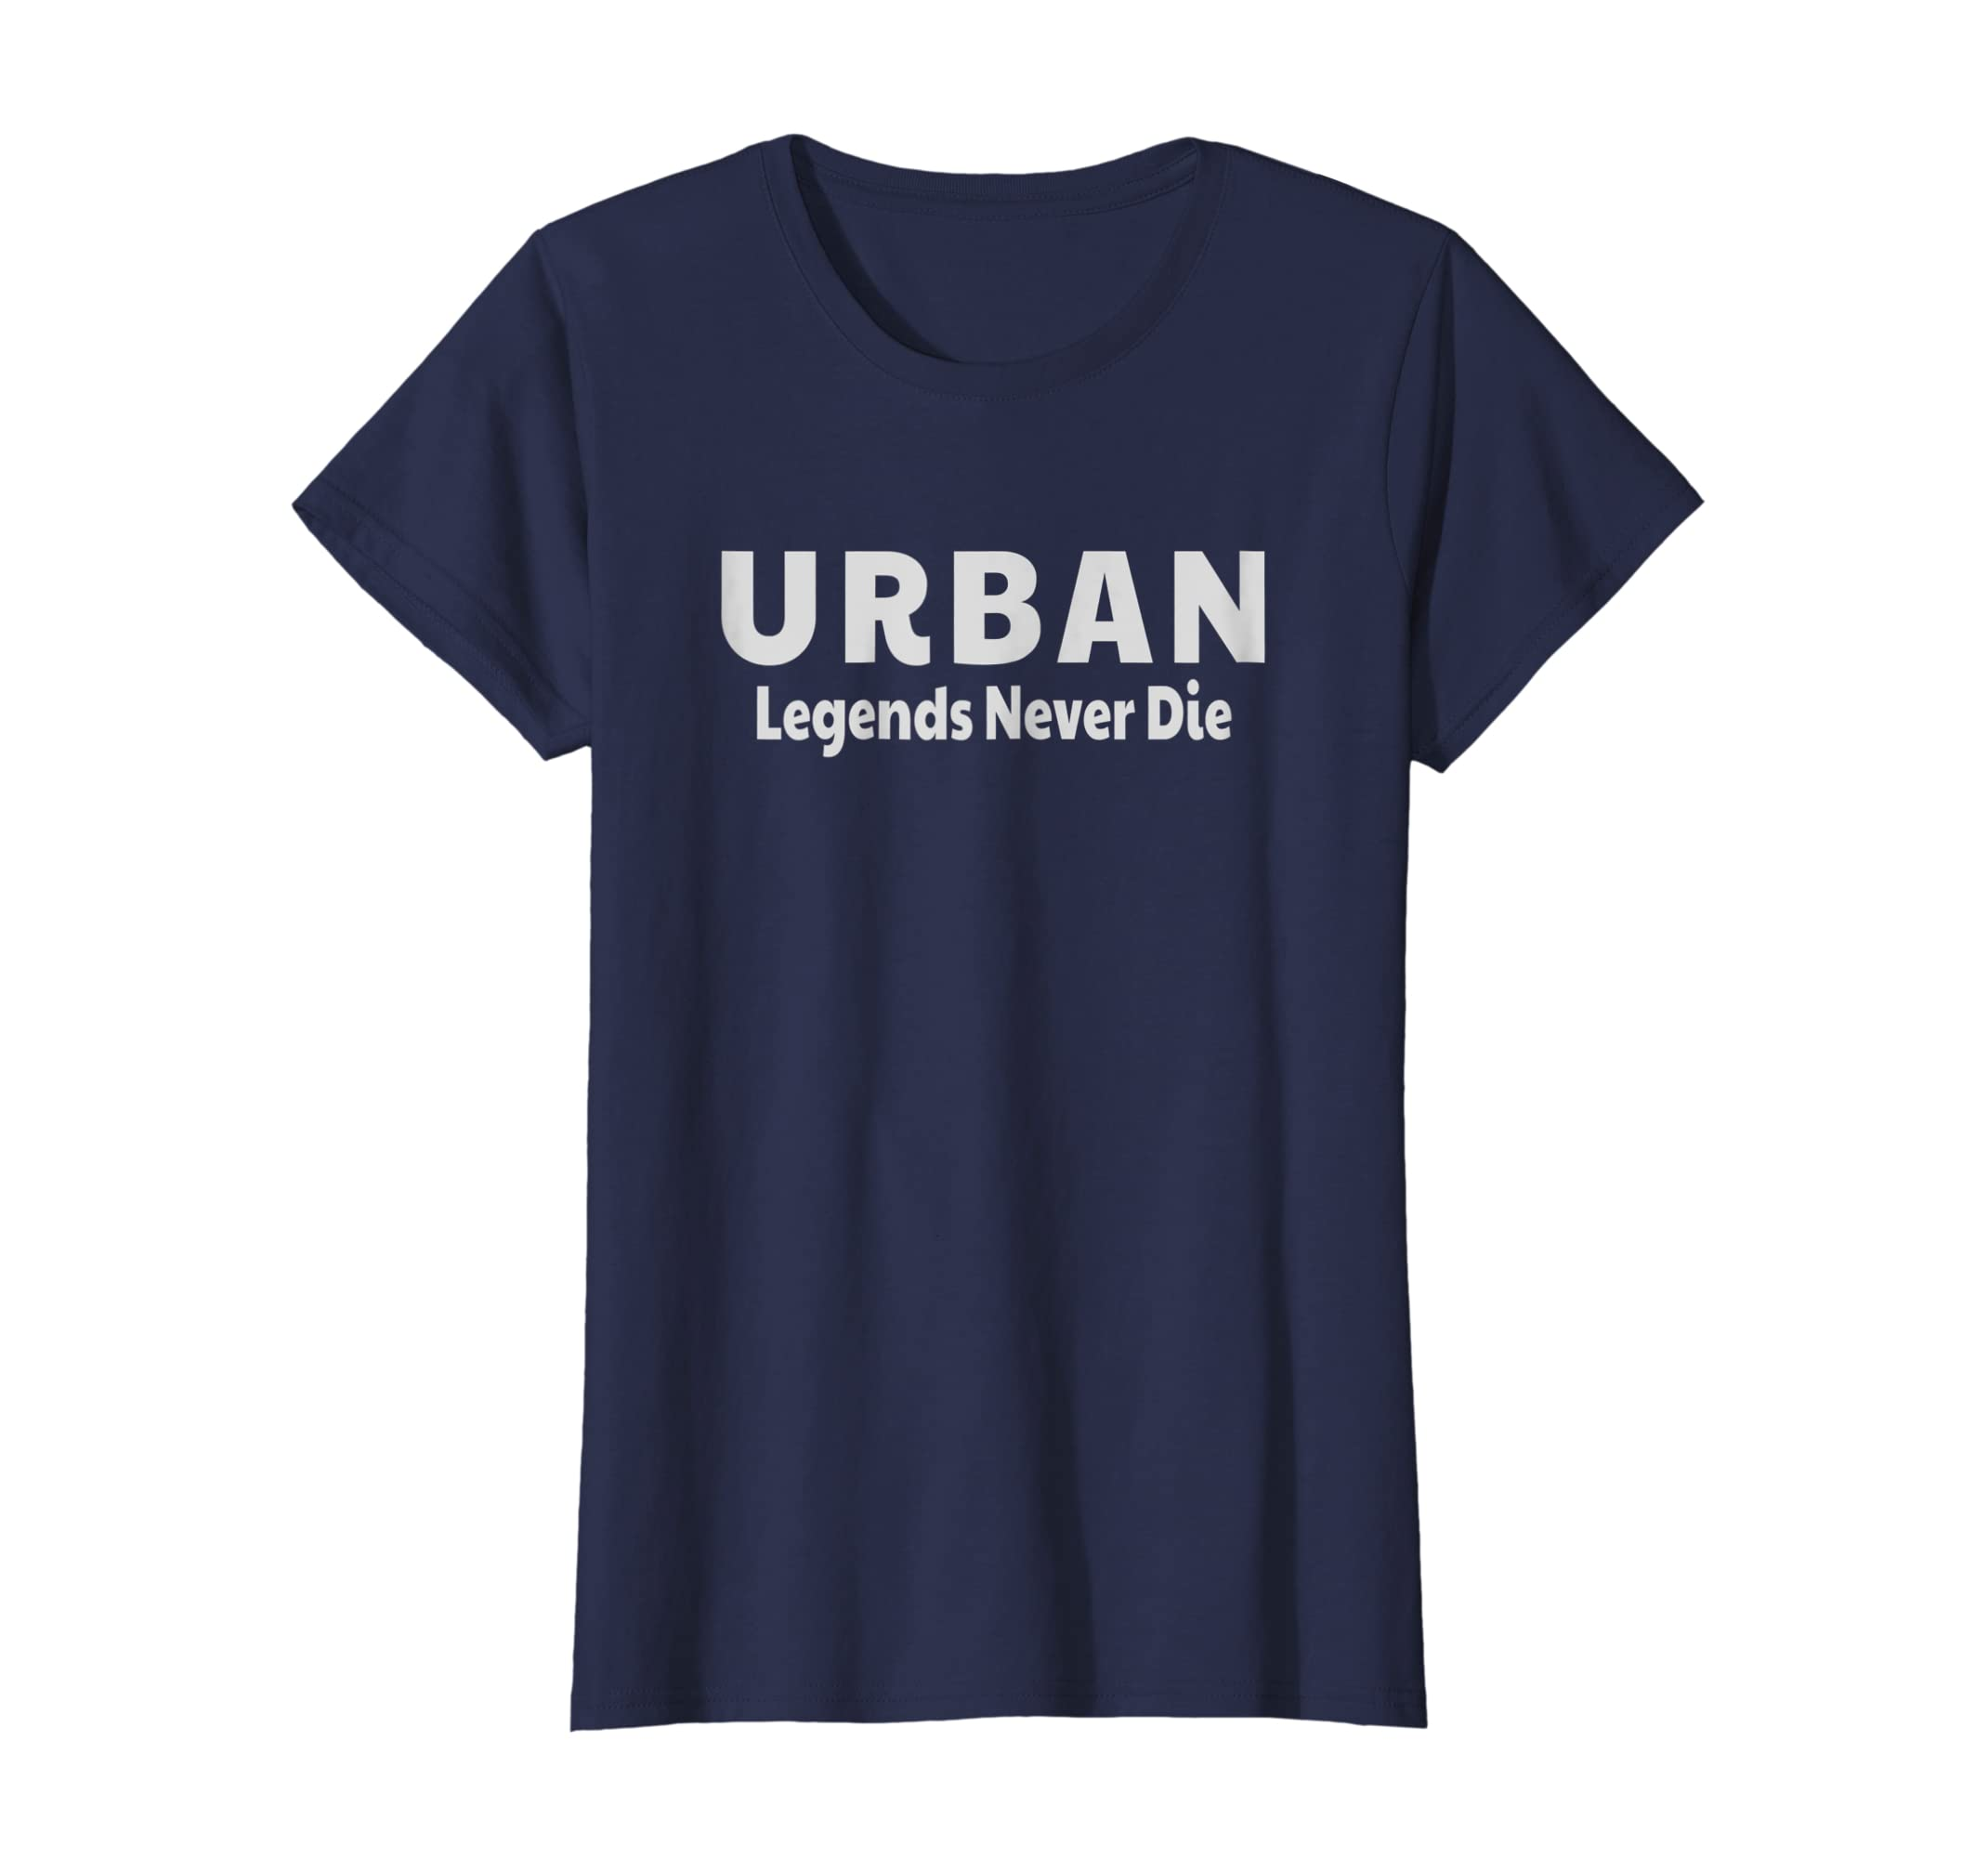 c9244c2da705 Amazon.com  Urban Legends Never Die T-Shirt